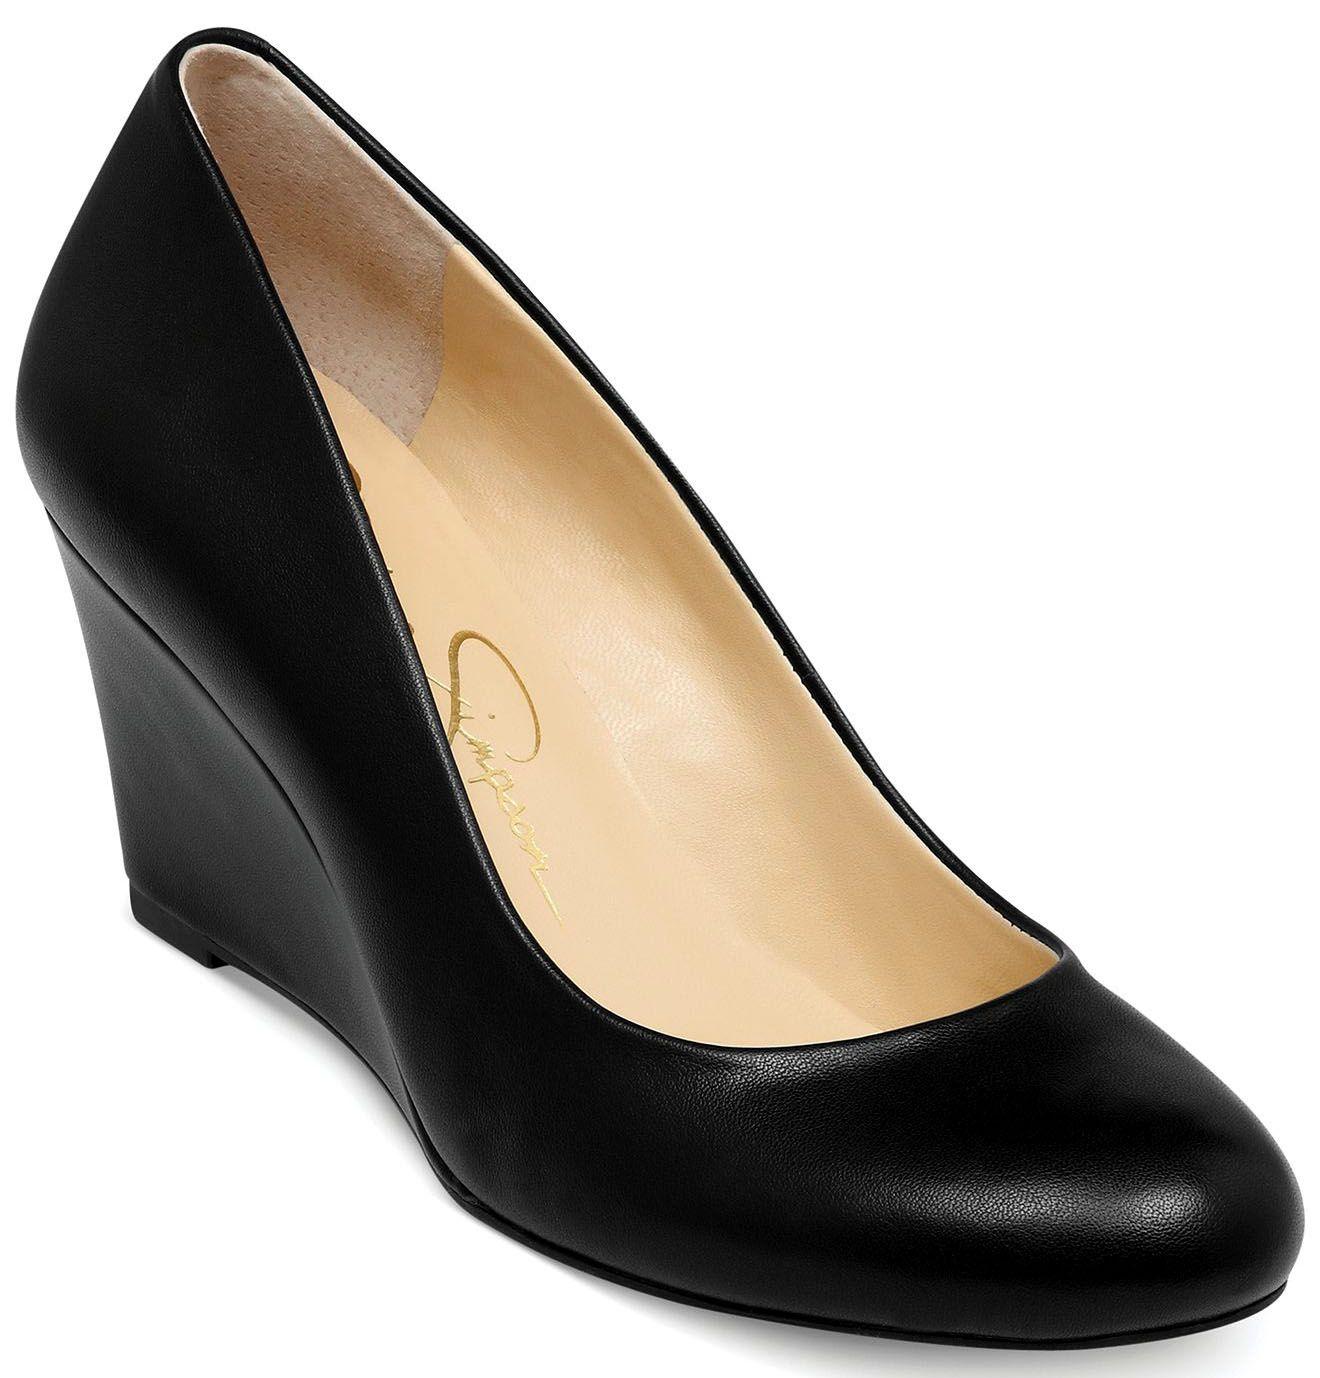 Black wedge shoes, Pump shoes, Wedge pumps